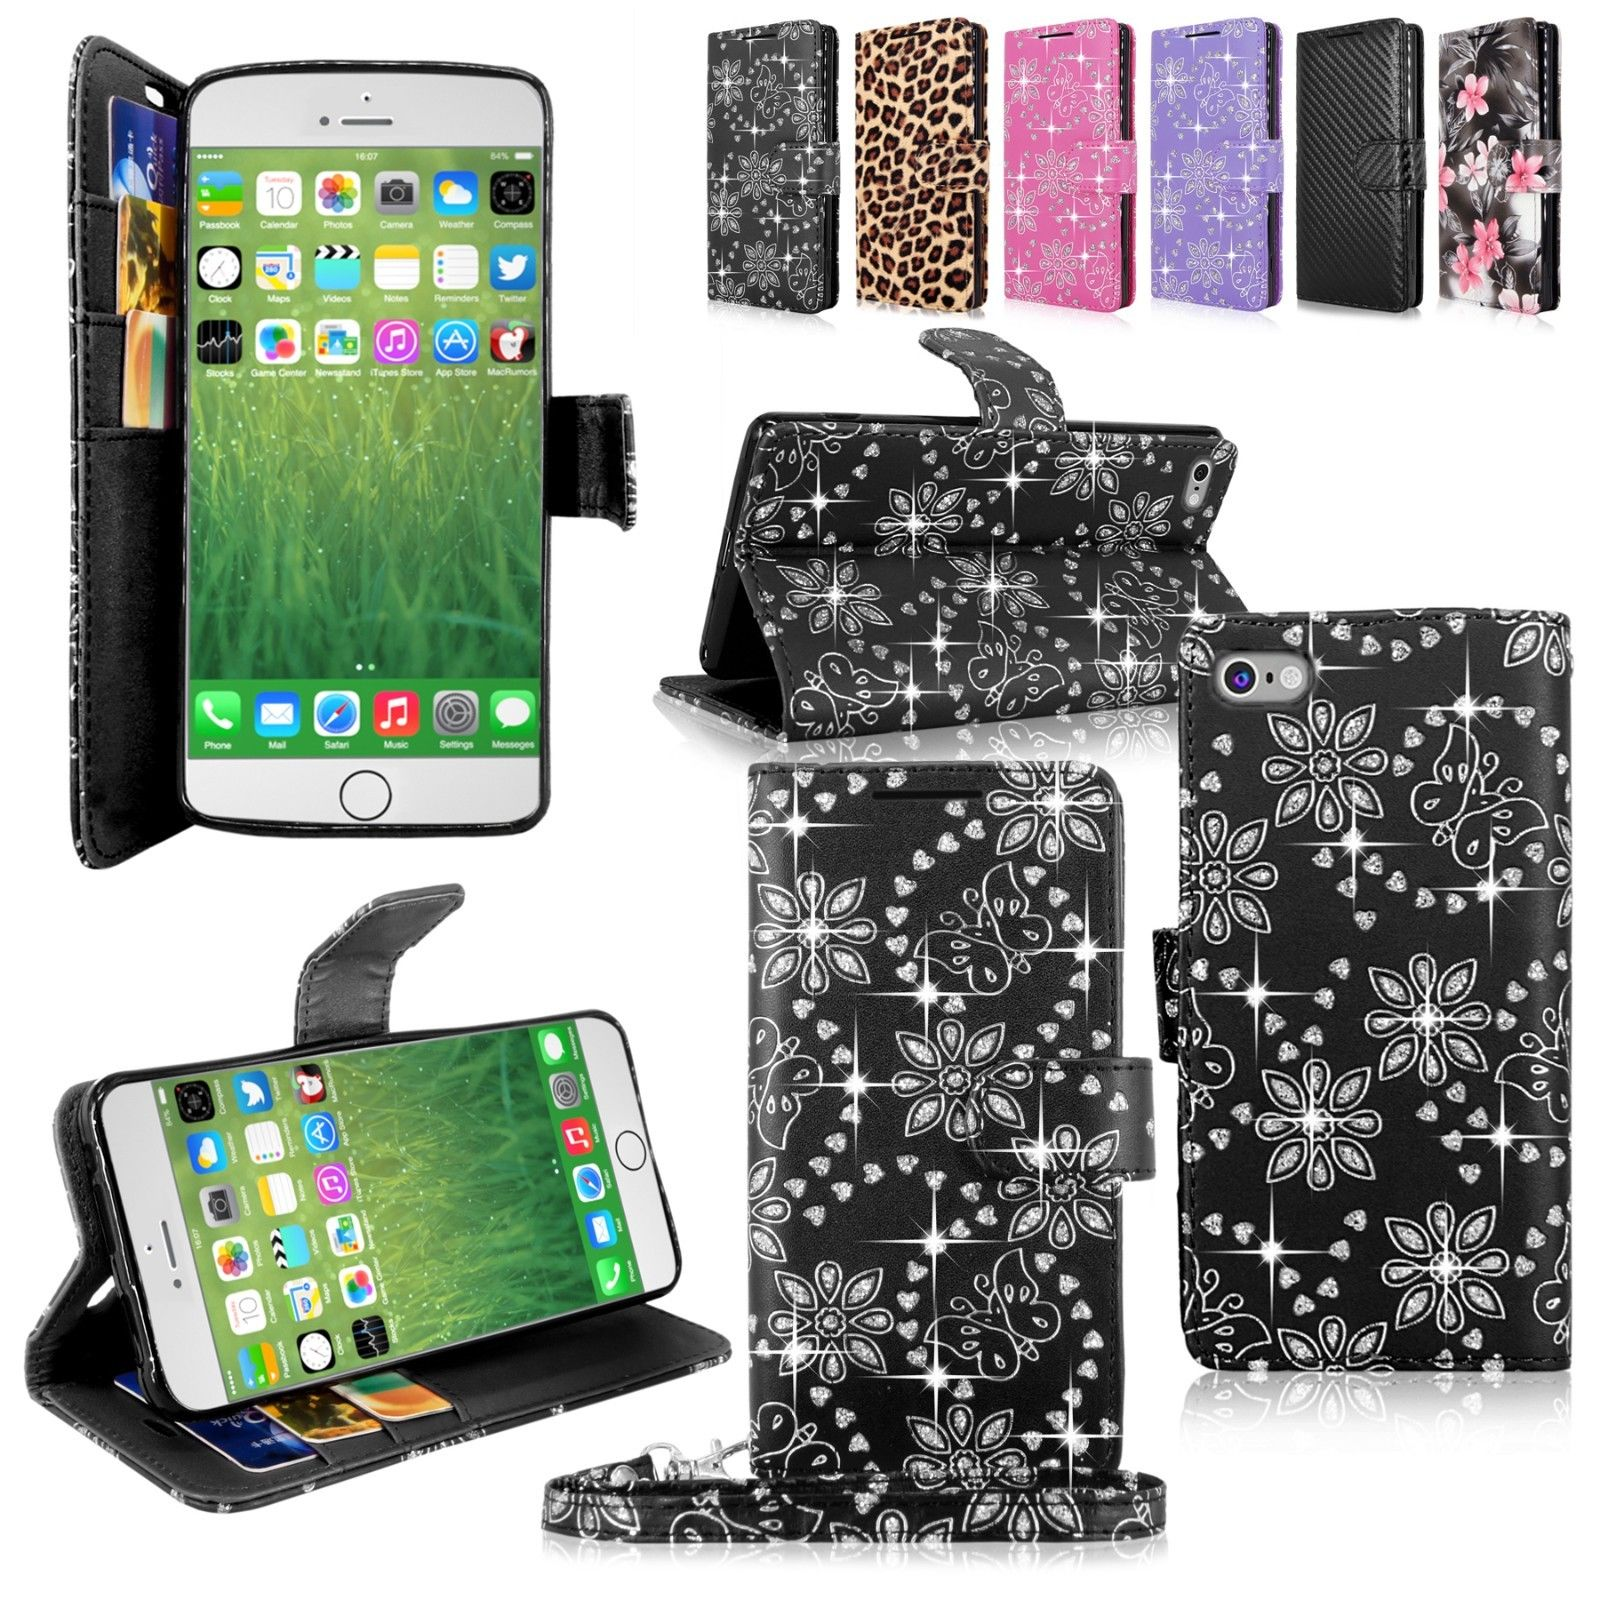 Bling Glitter Pu Leather Flip Wallet Pocket Case W/Strap For Many Phones Model